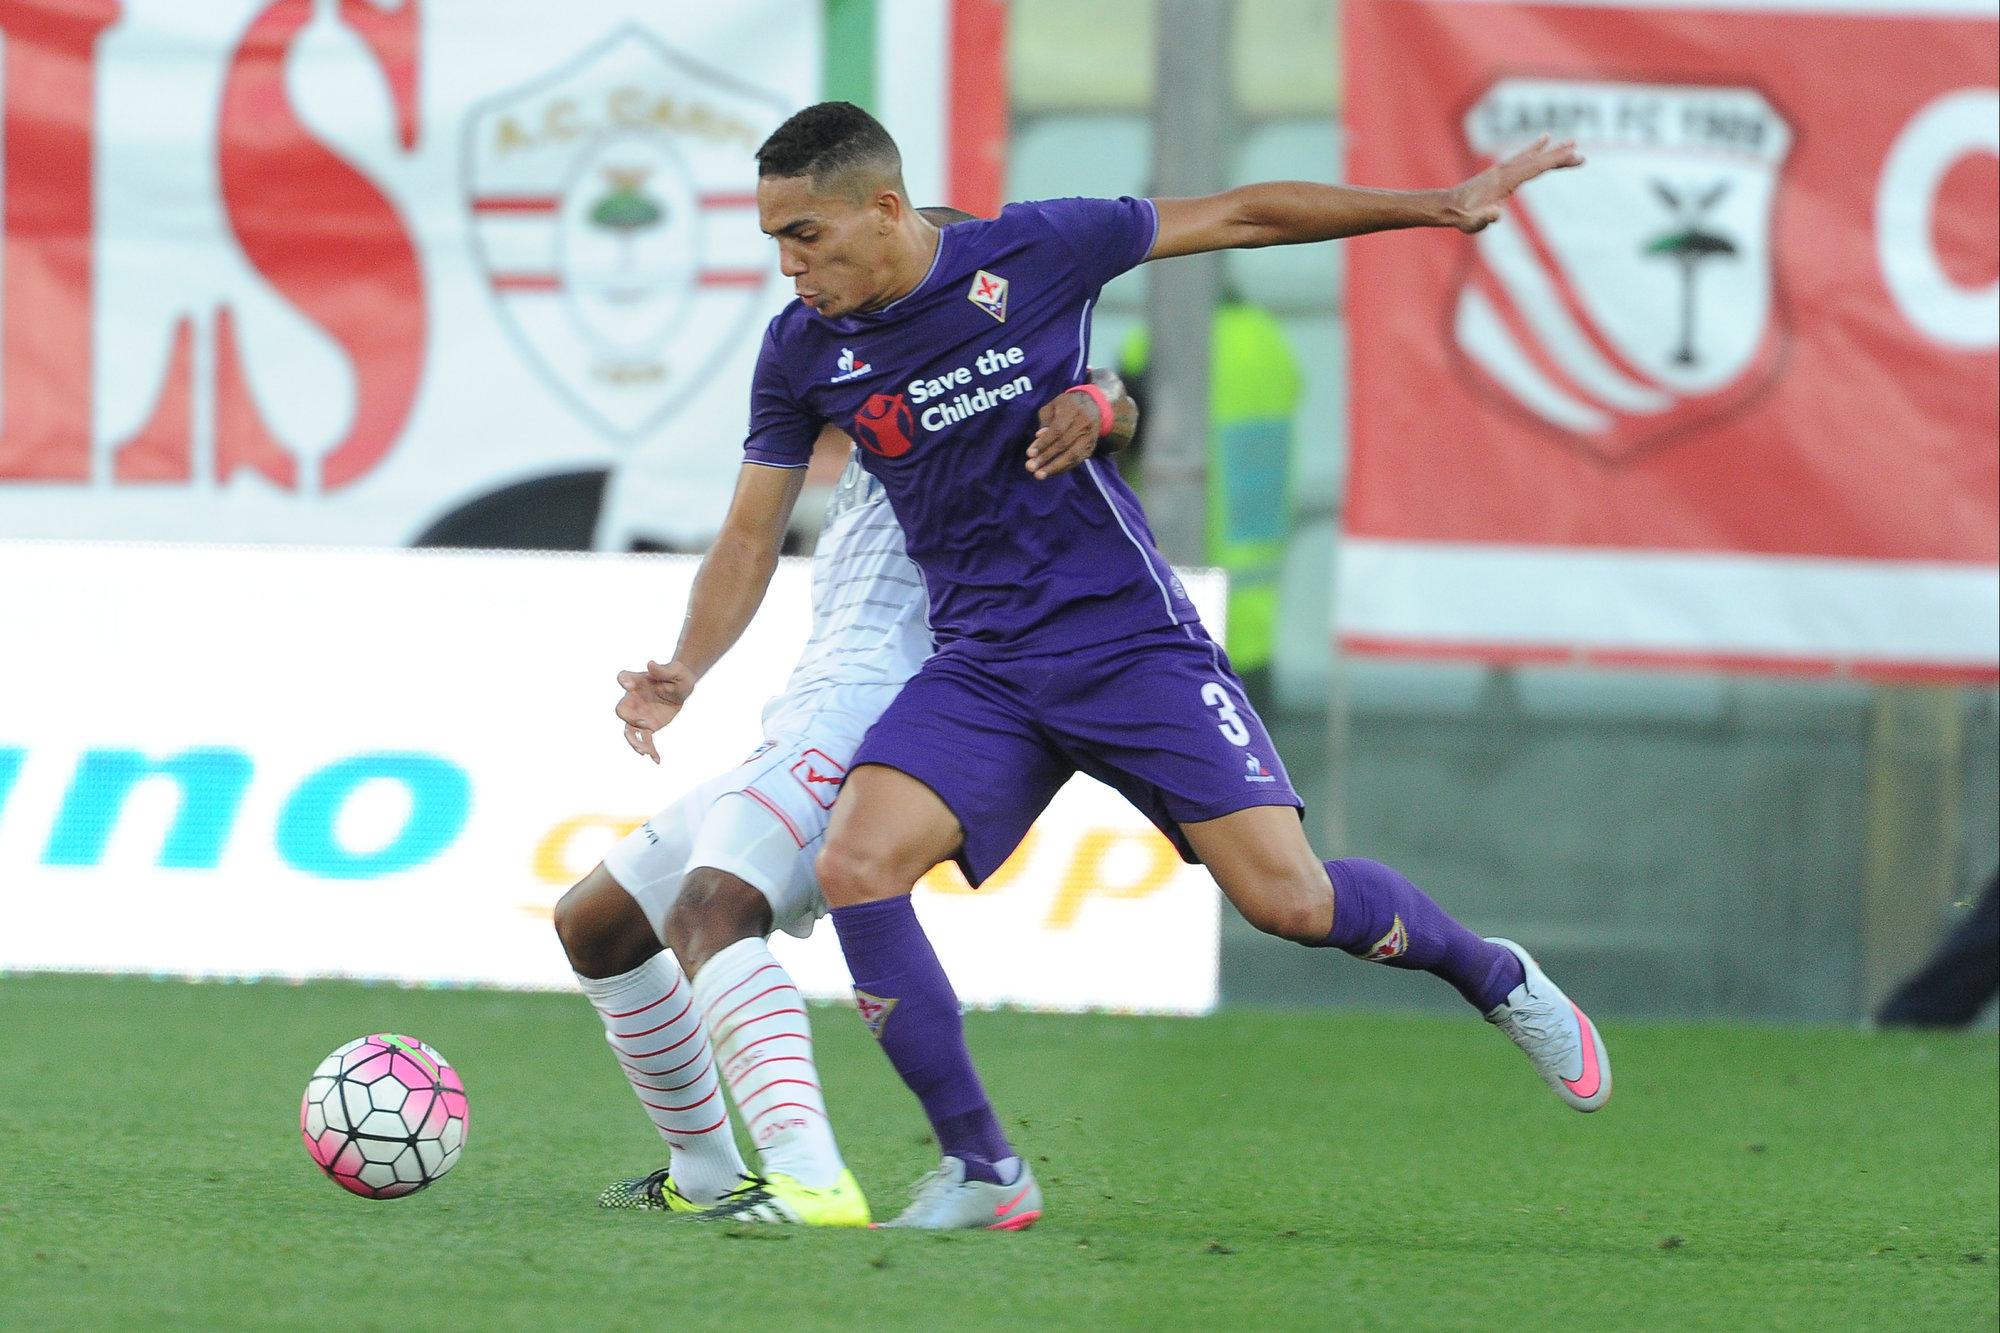 Carpi - Fiorentina